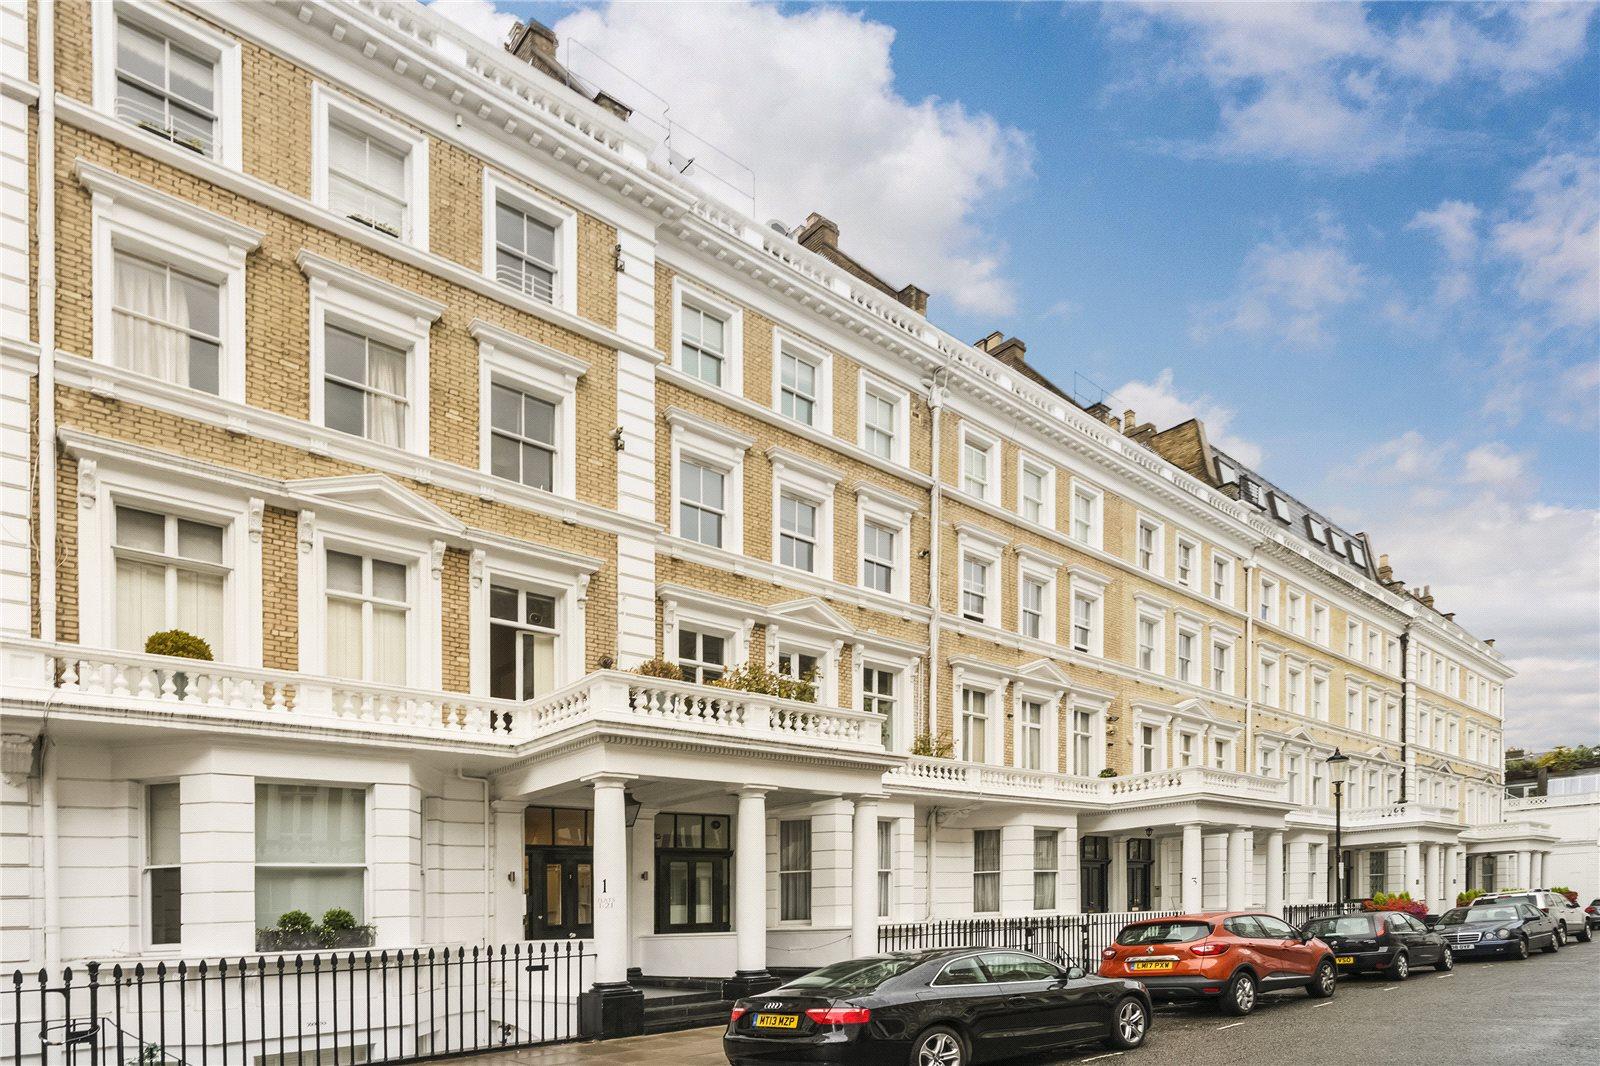 Additional photo for property listing at Manson Place, South Kensington, London, SW7 South Kensington, London, Engeland